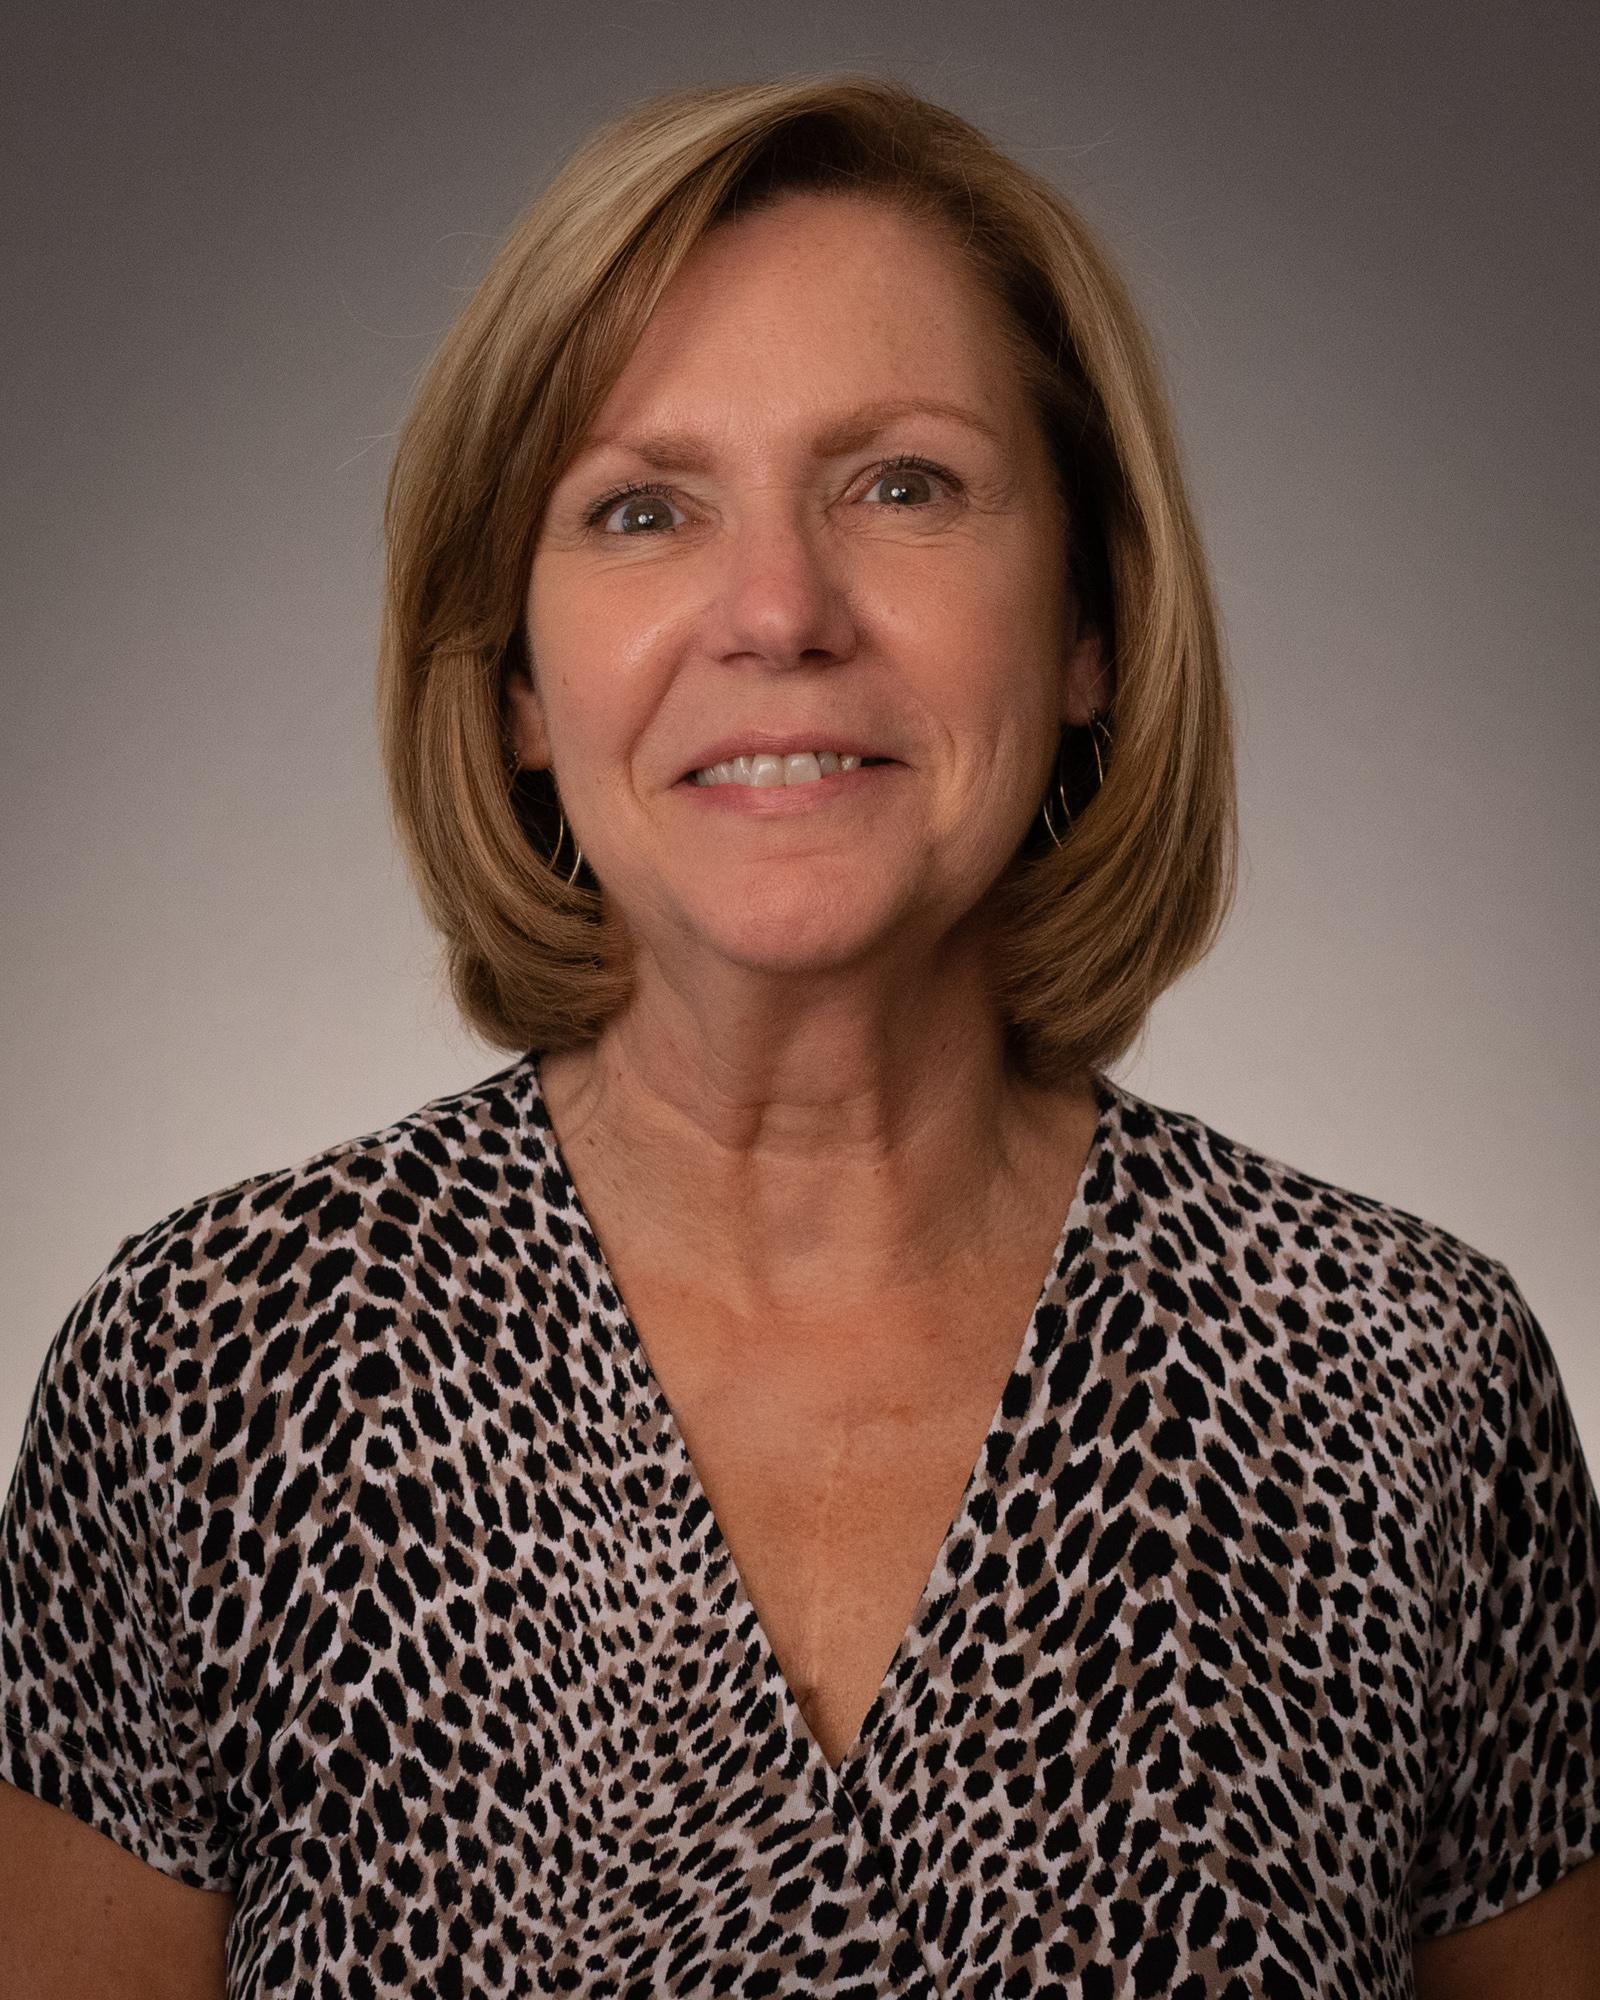 Michelle Swain